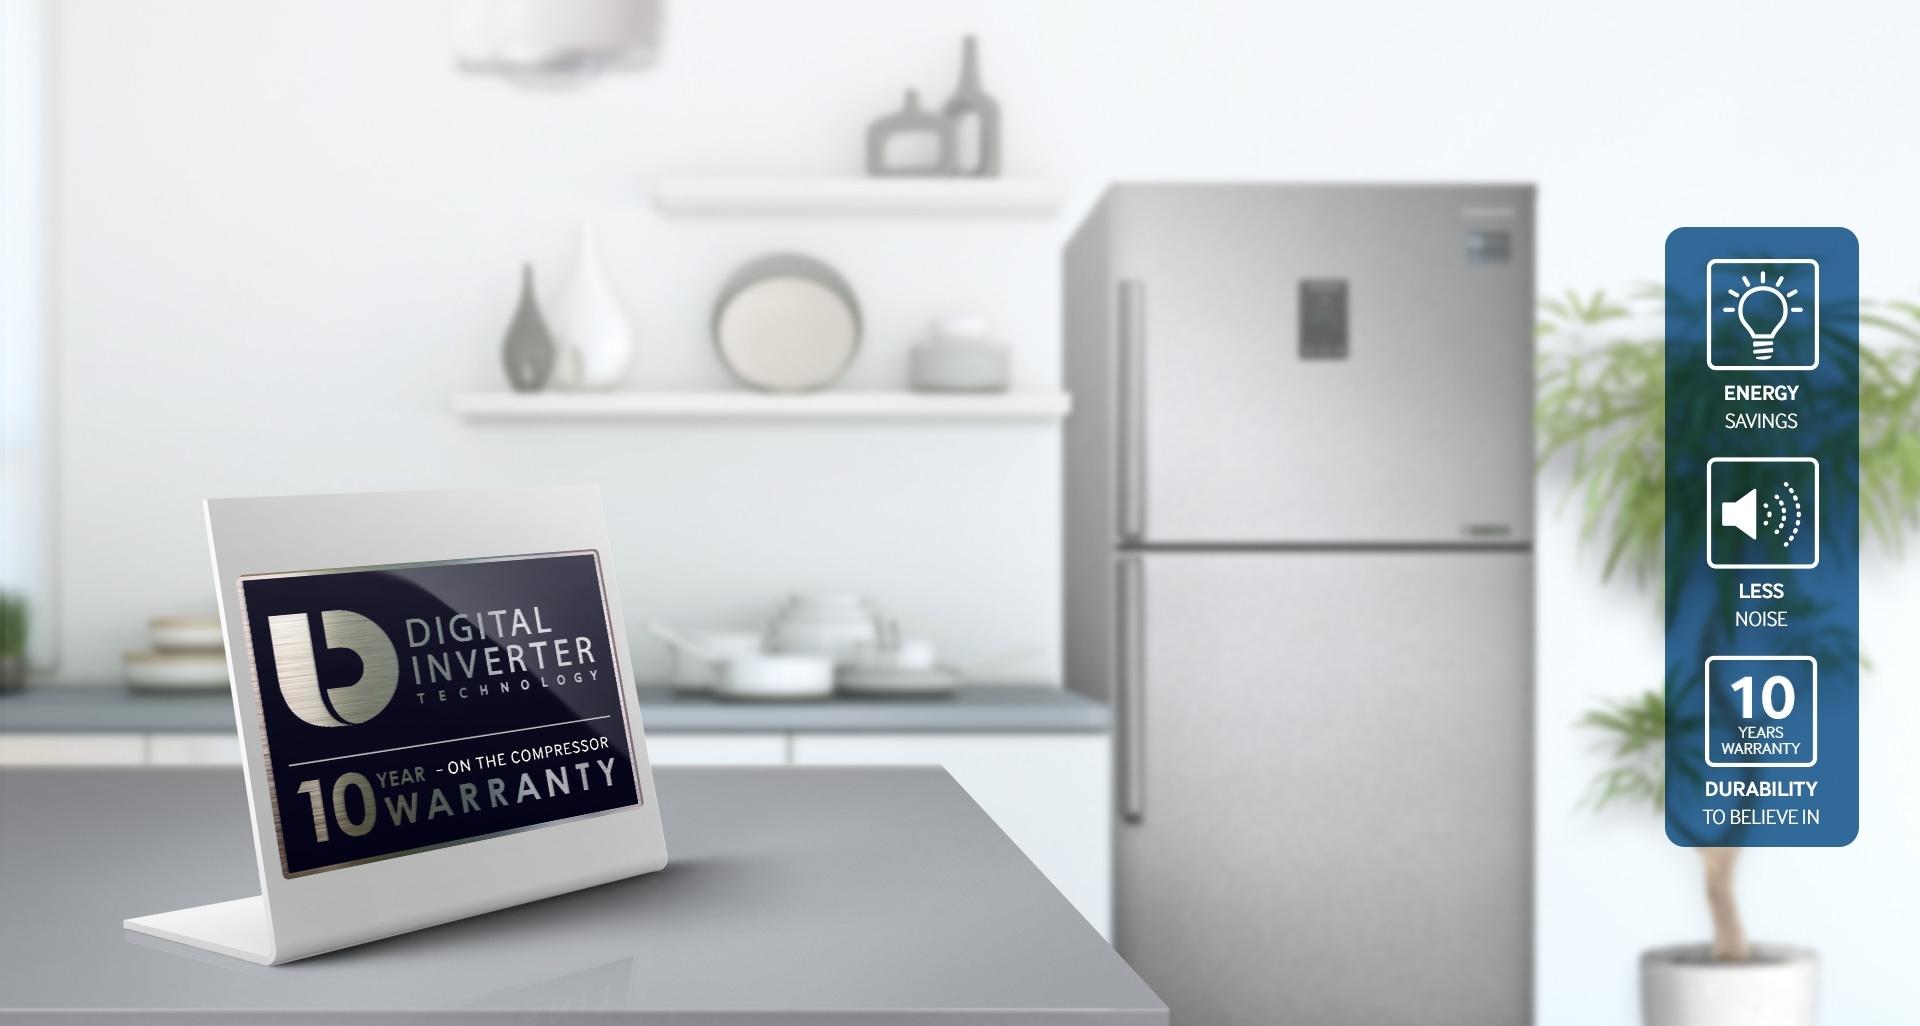 Tủ Lạnh Inverter Samsung RT29K5532S8/SV (299L)